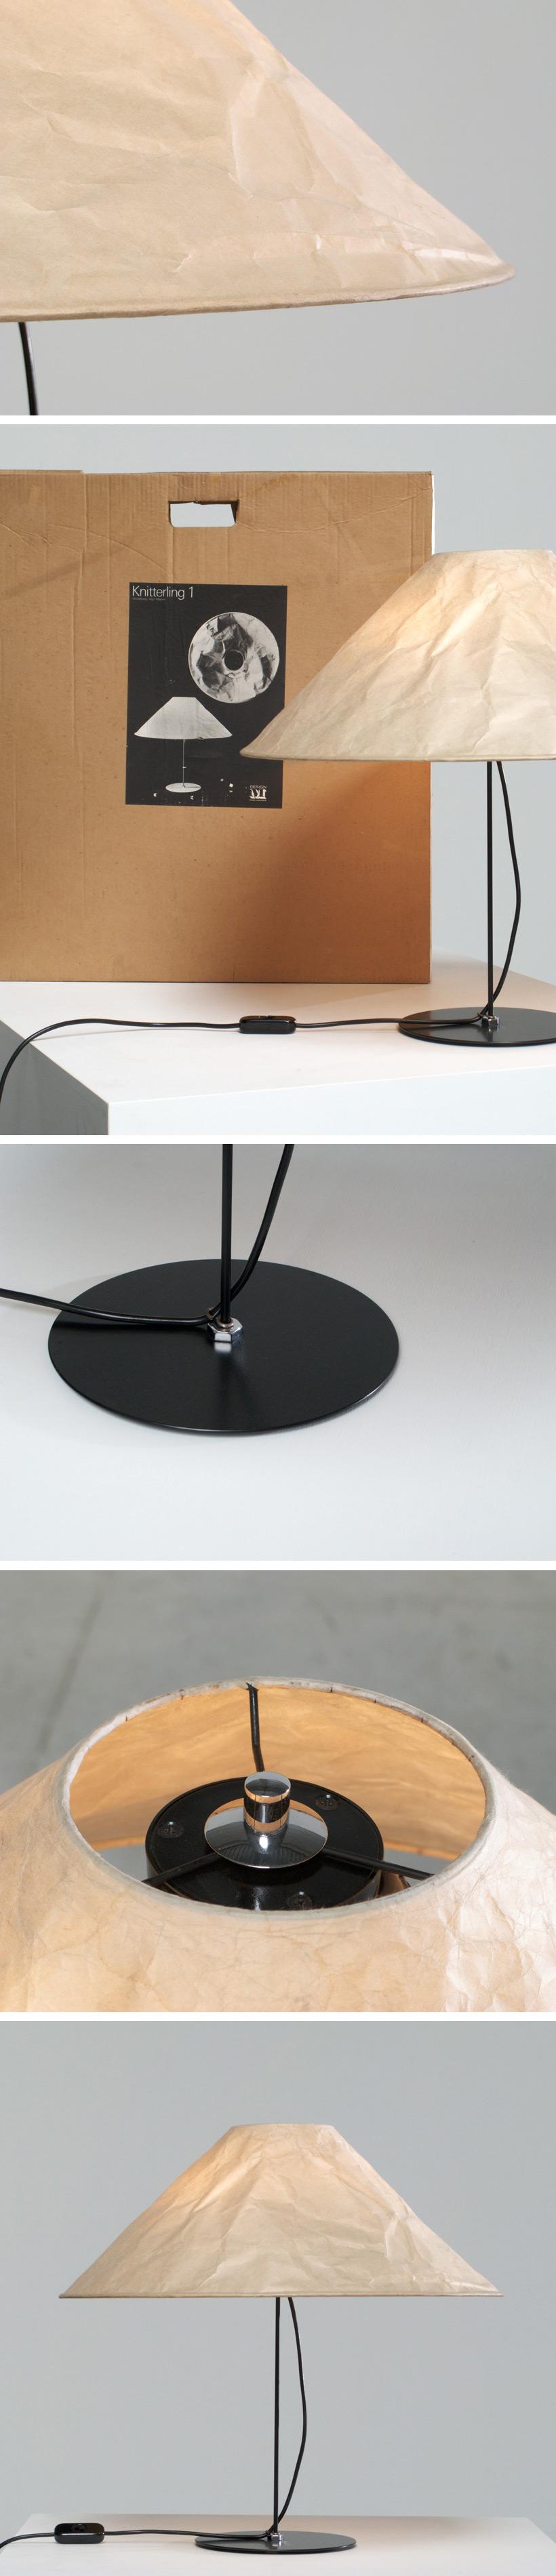 Ingo Maurer table lamp Knitterling Large